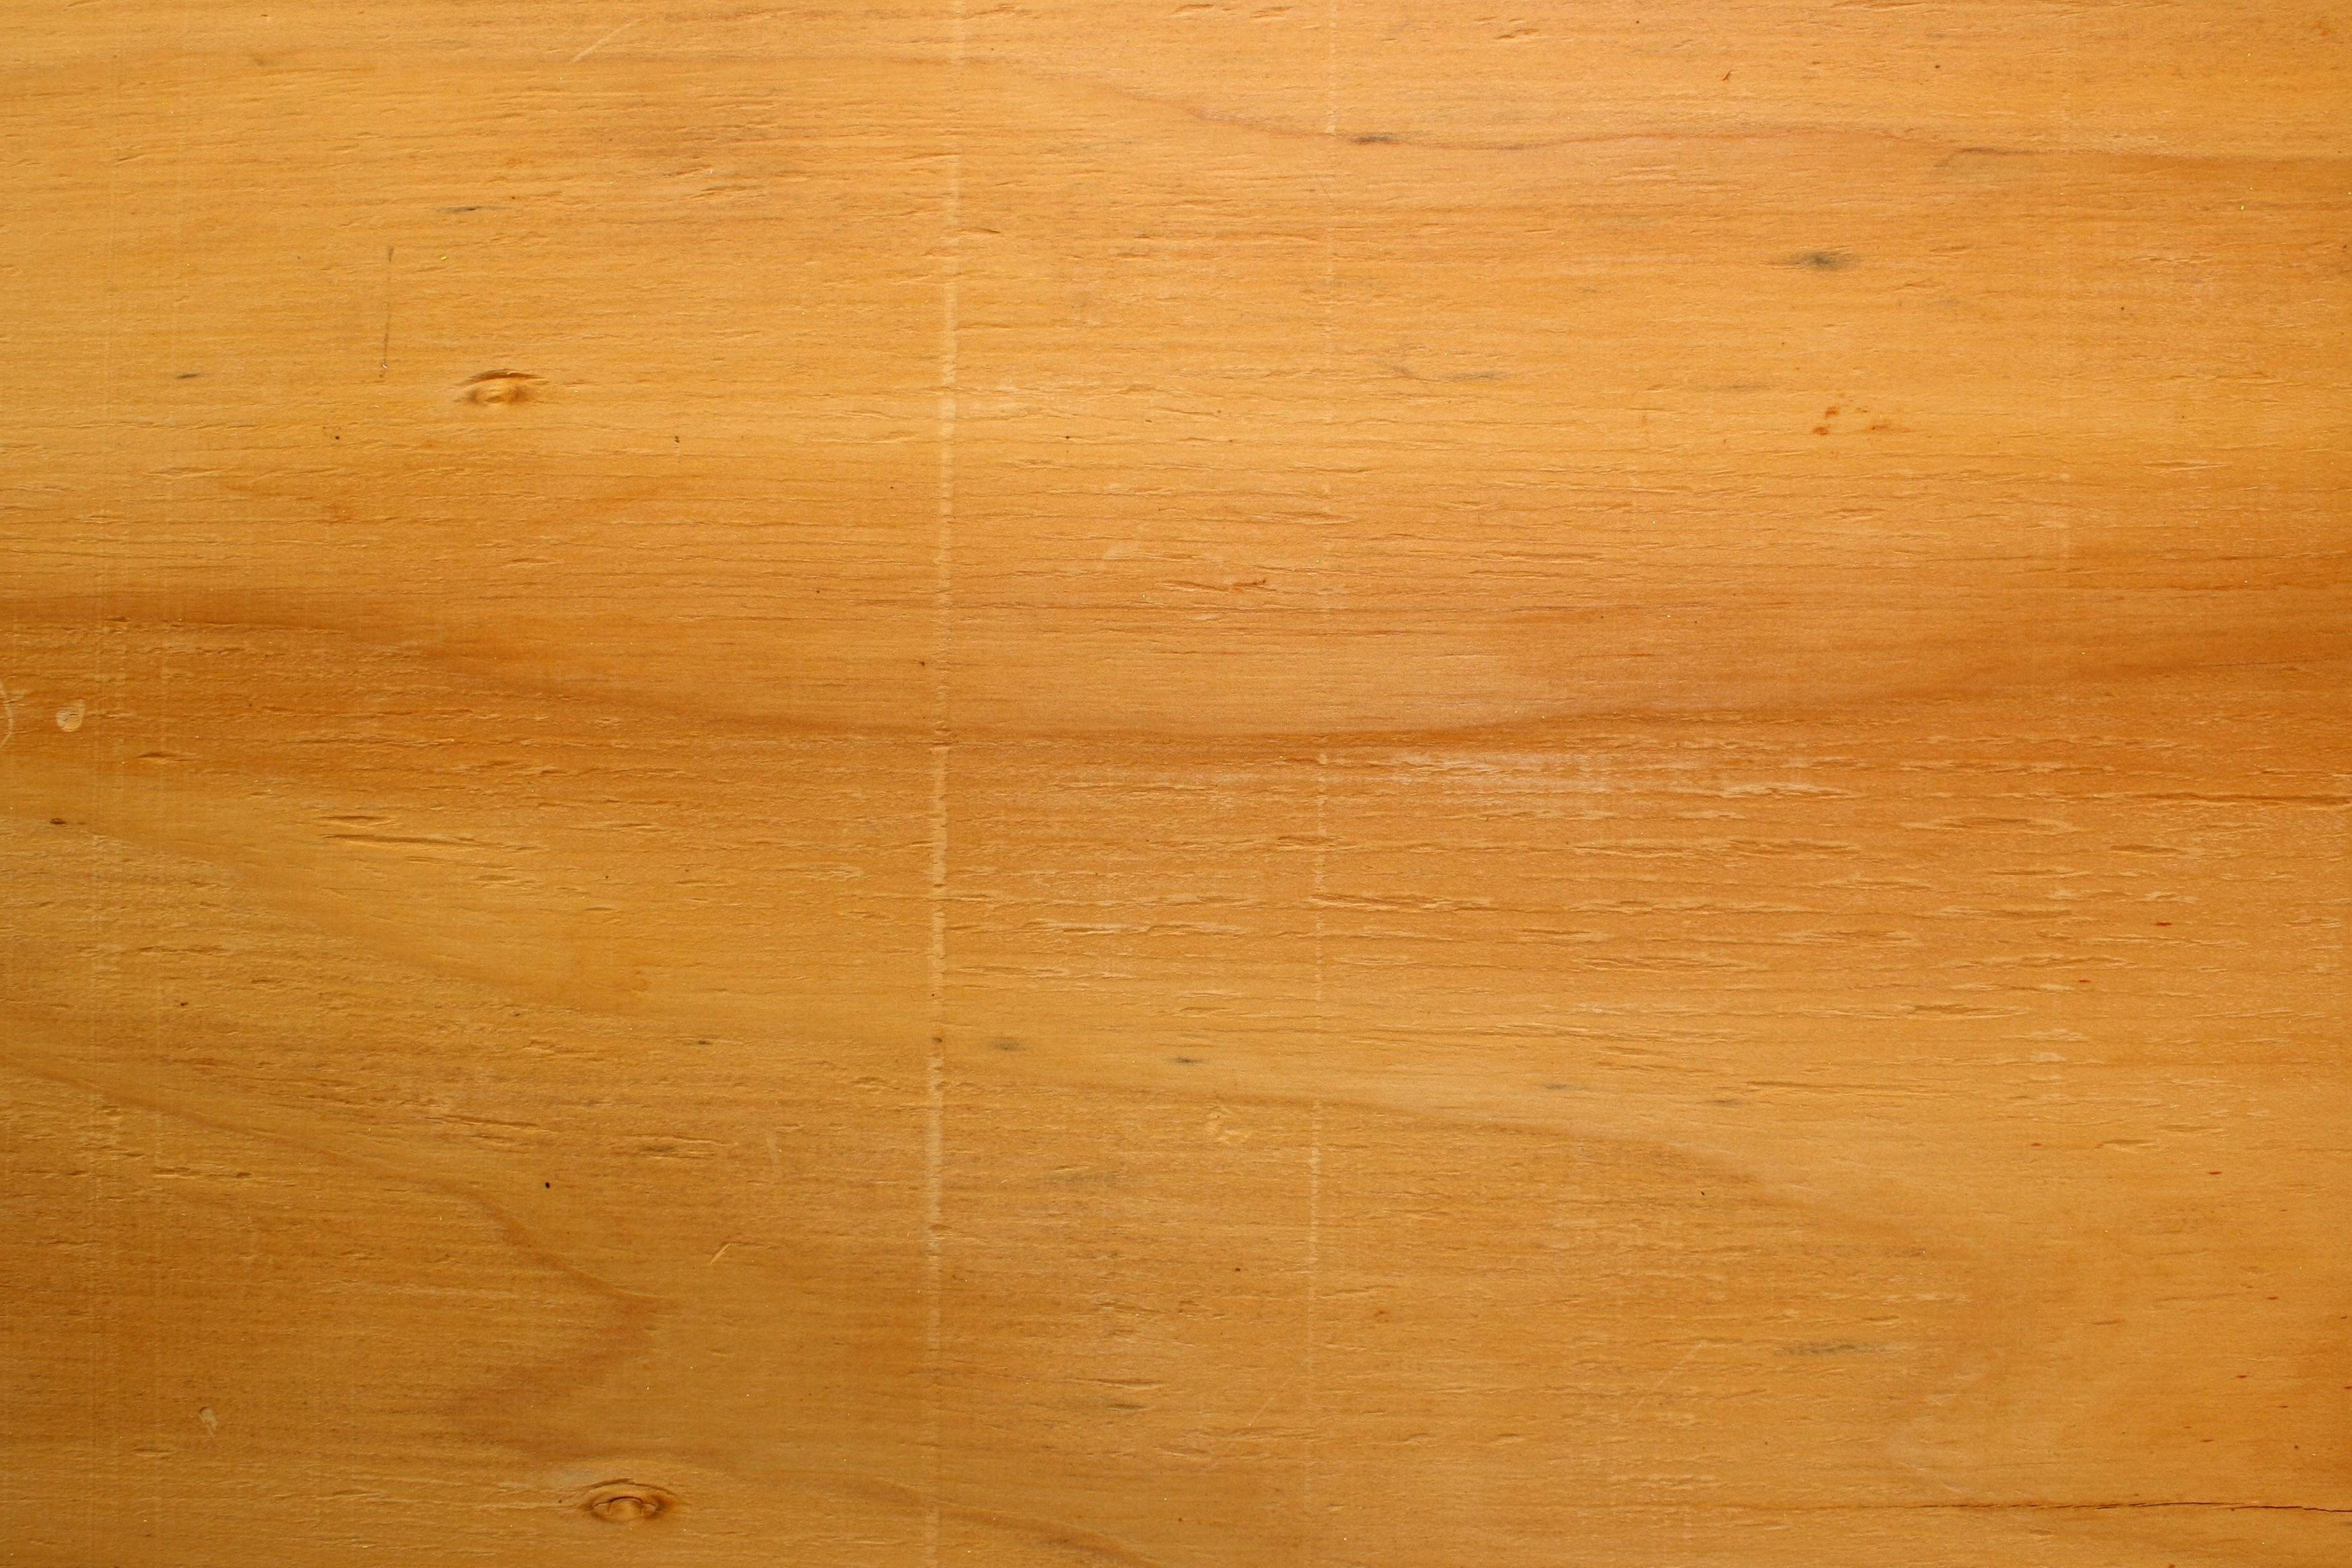 Wood Grain Desktop Wallpapers - - 953.4KB